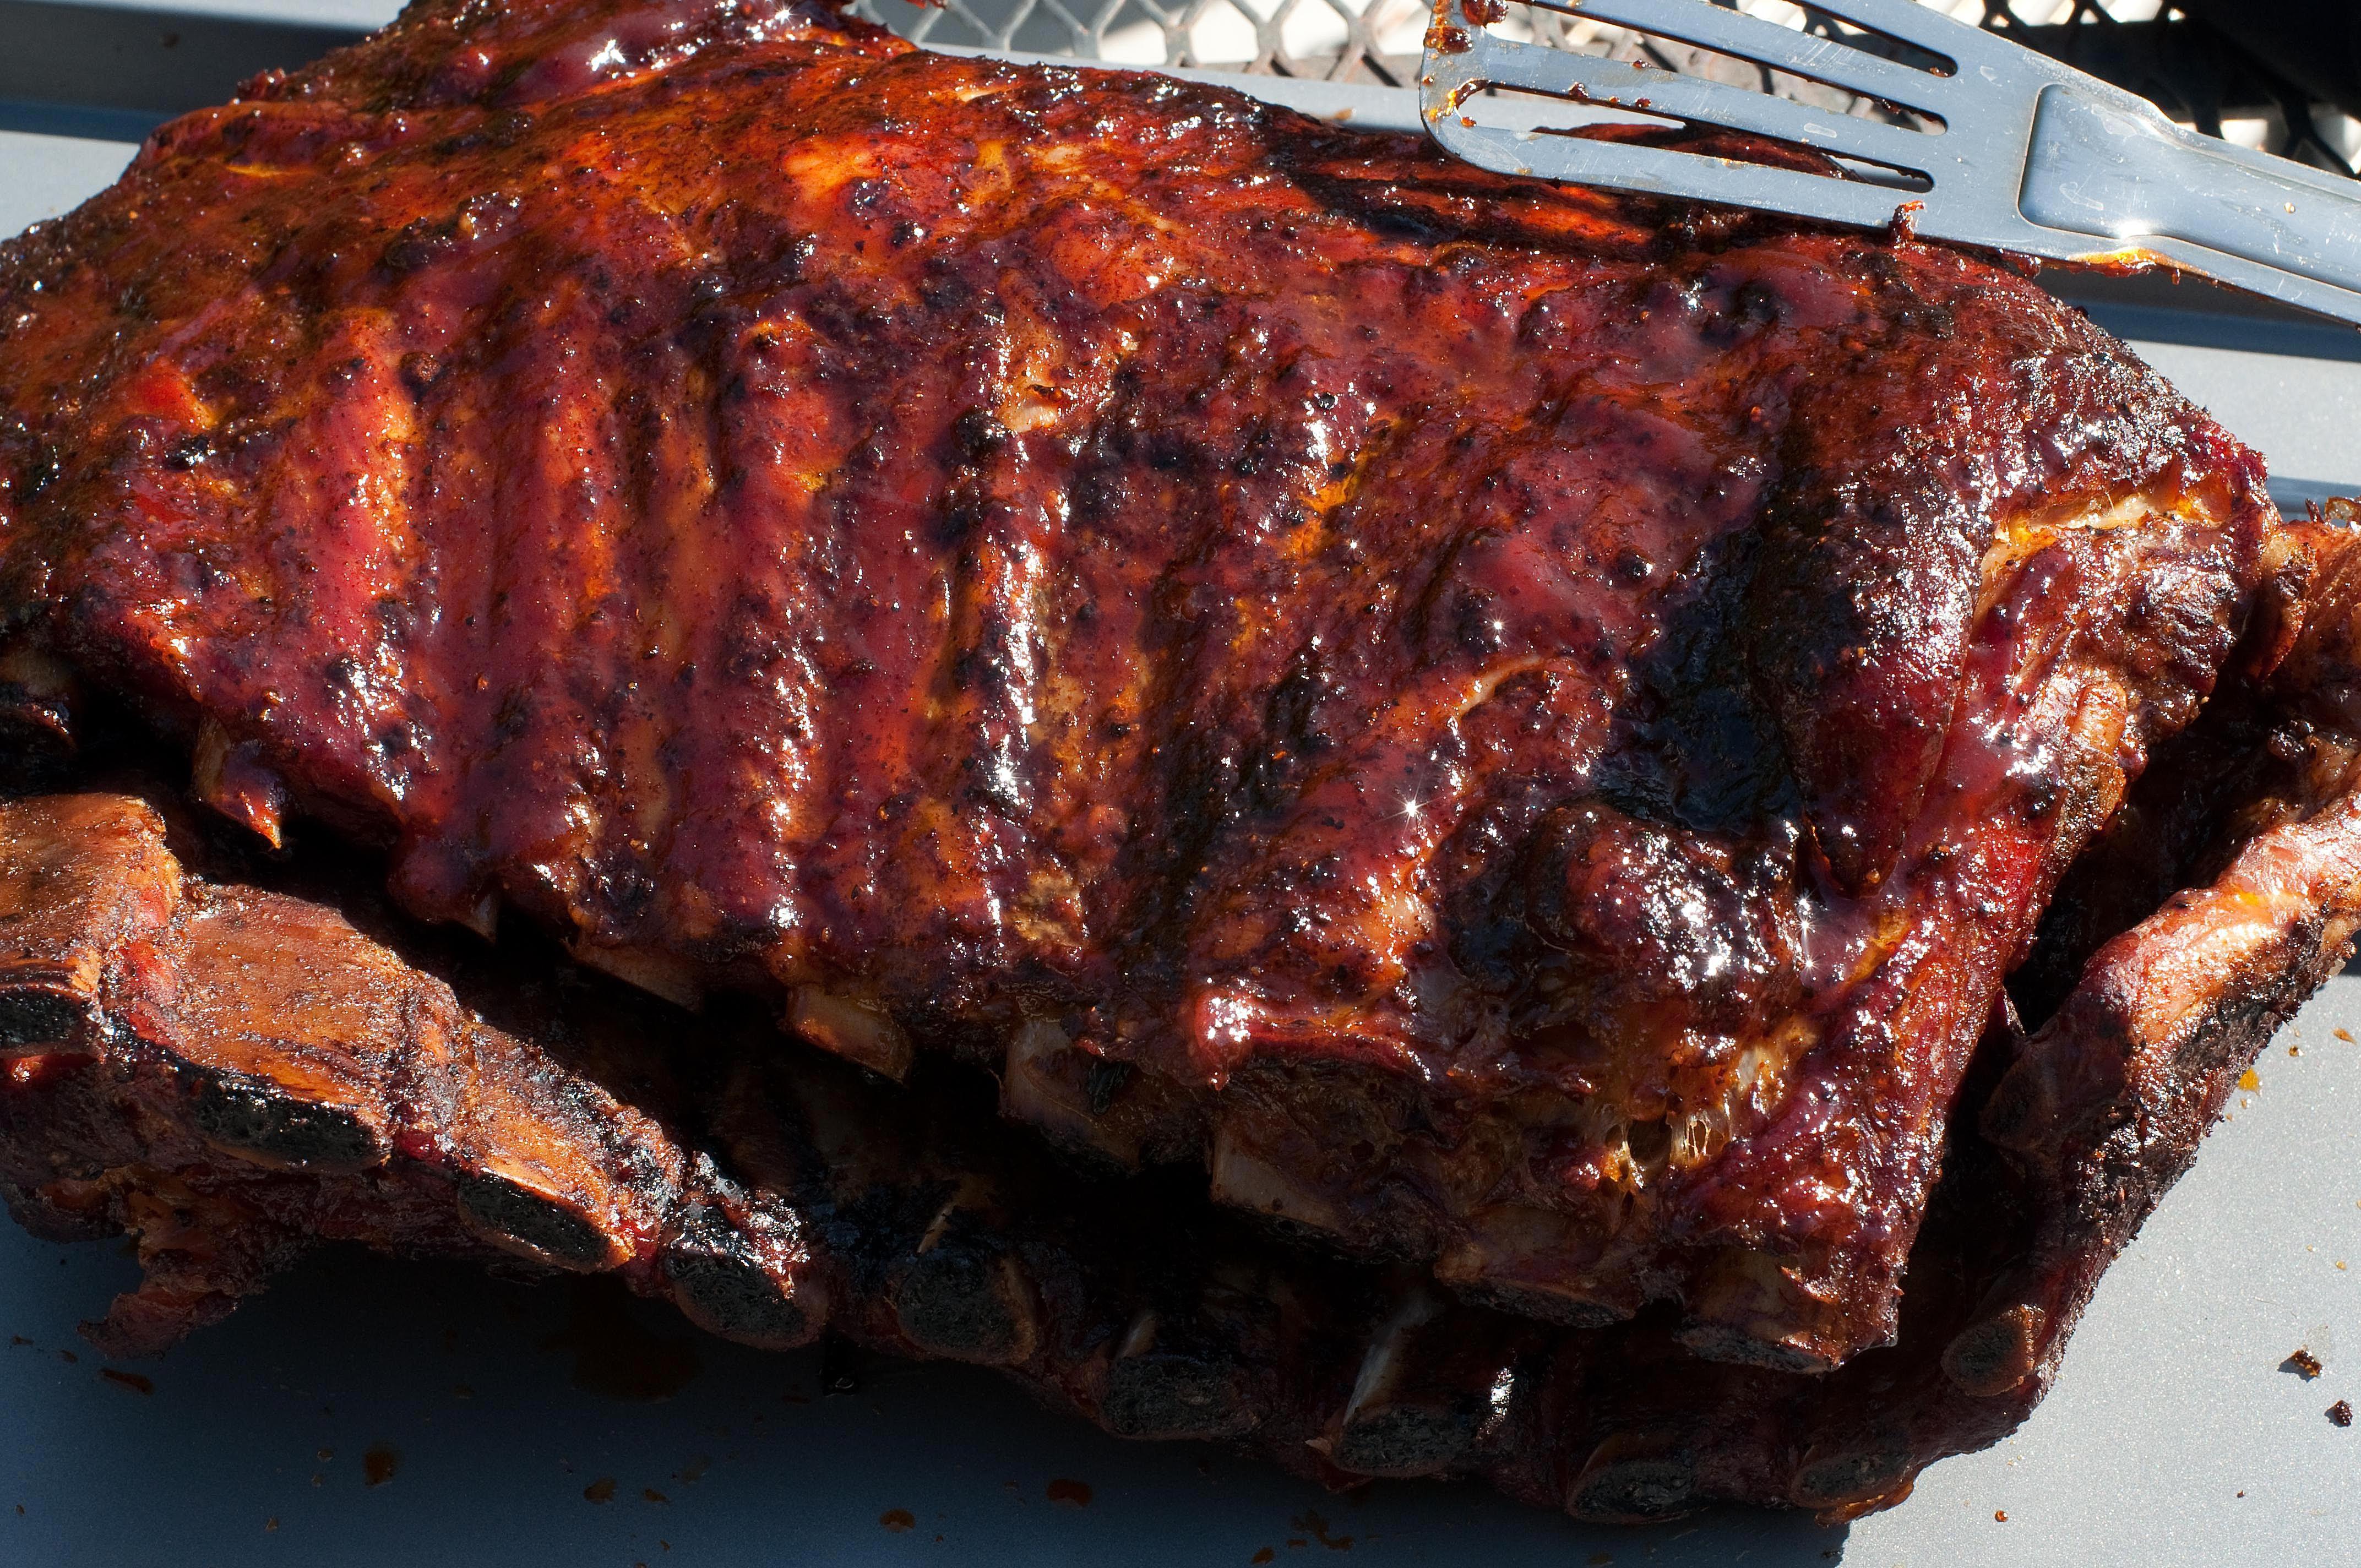 Hoisin Glazed Barbecue Pork Spare Ribs Recipe